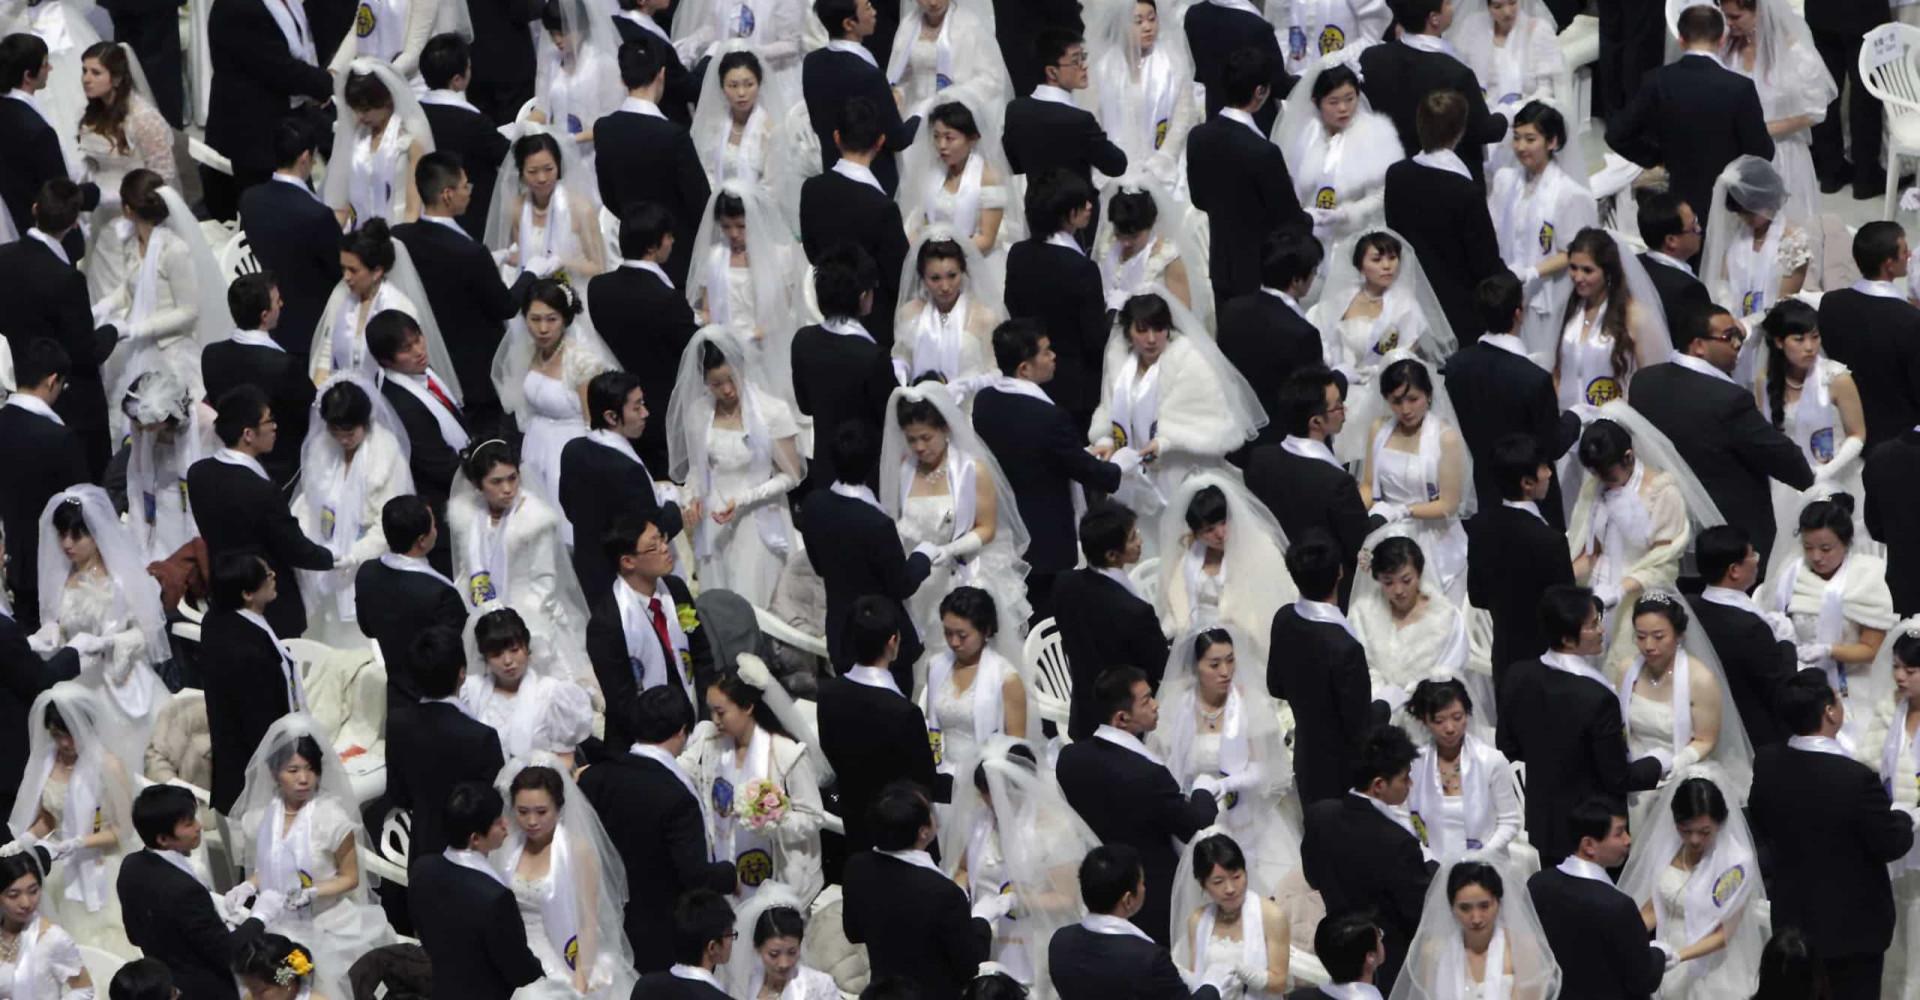 Incredible photos of mass weddings around the world